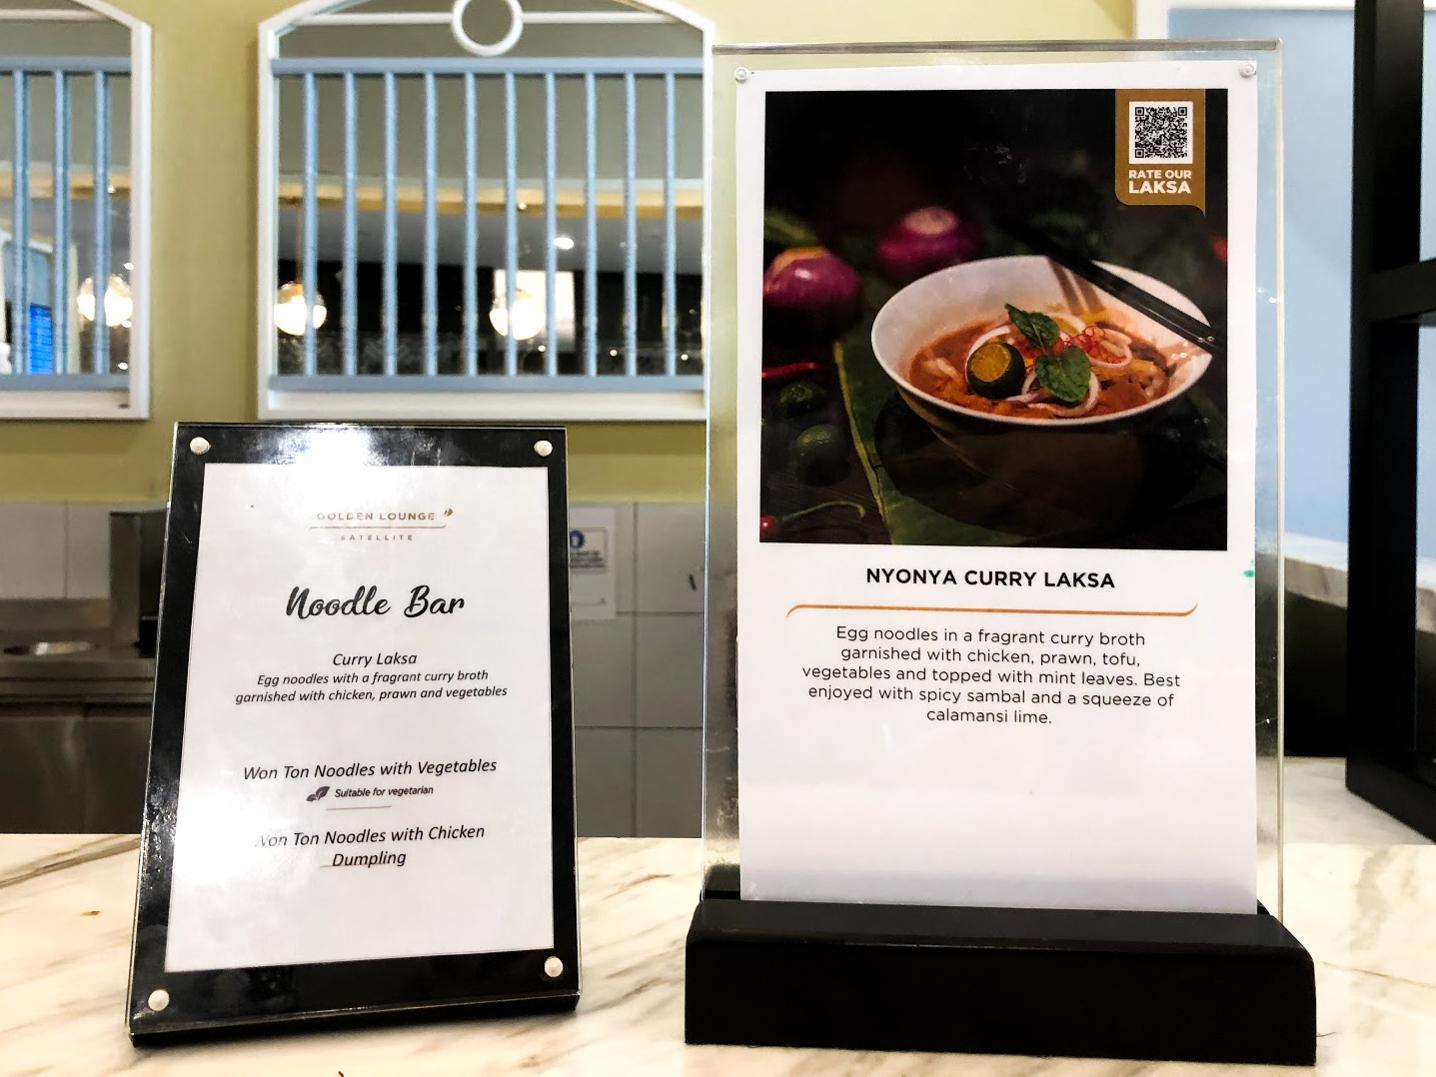 Malaysia Airlines Satellite Golden Lounge Kuala Lumpur noodle bar